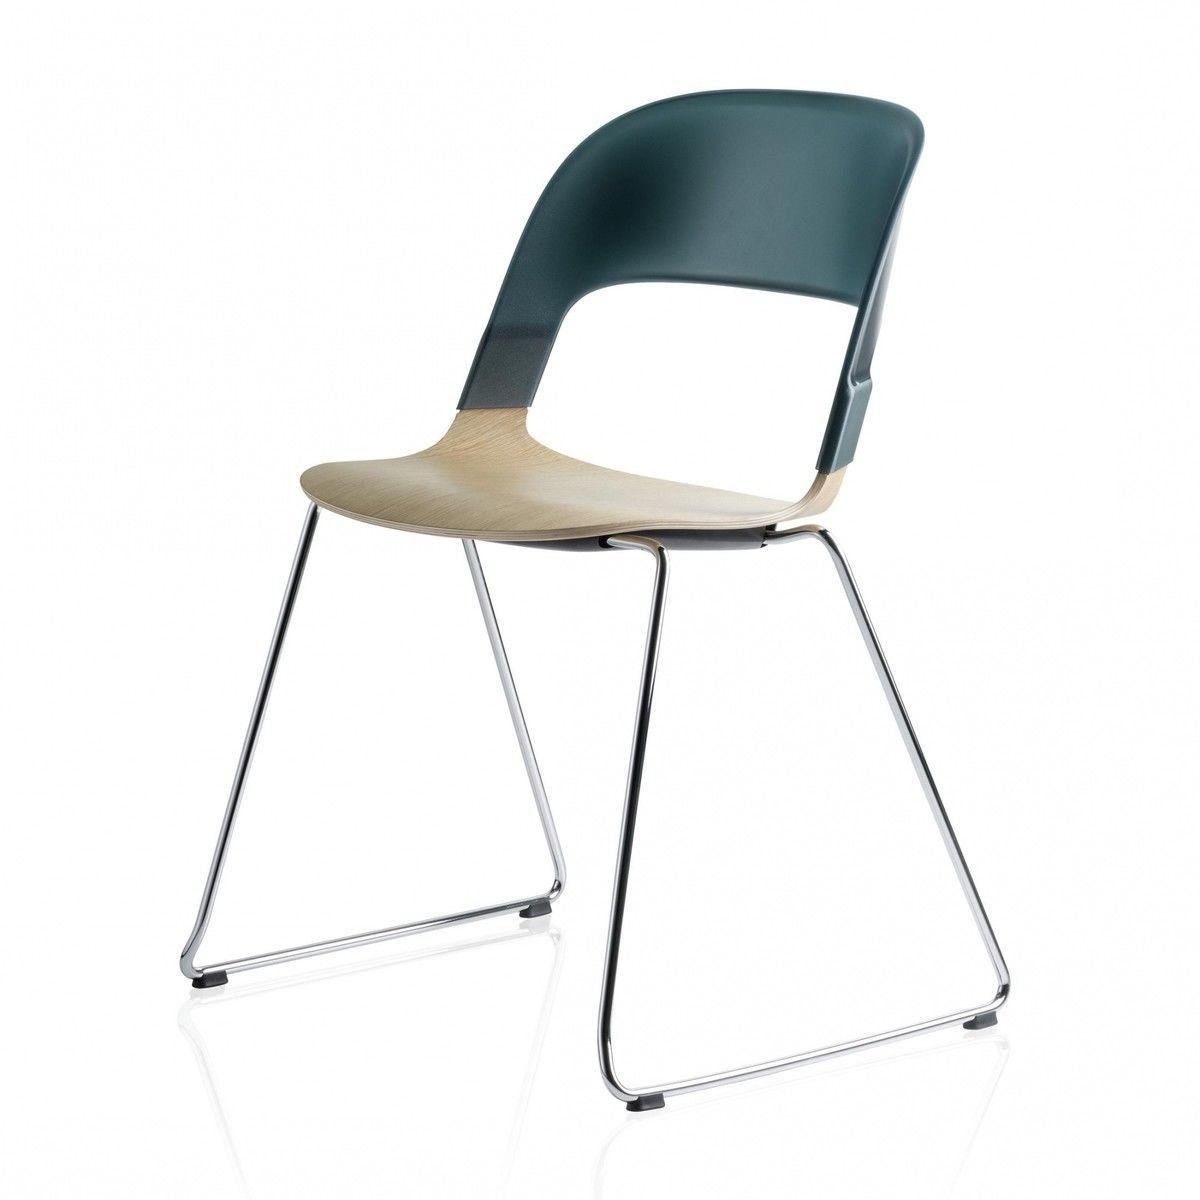 pair chair bh21 chaise fritz hansen. Black Bedroom Furniture Sets. Home Design Ideas